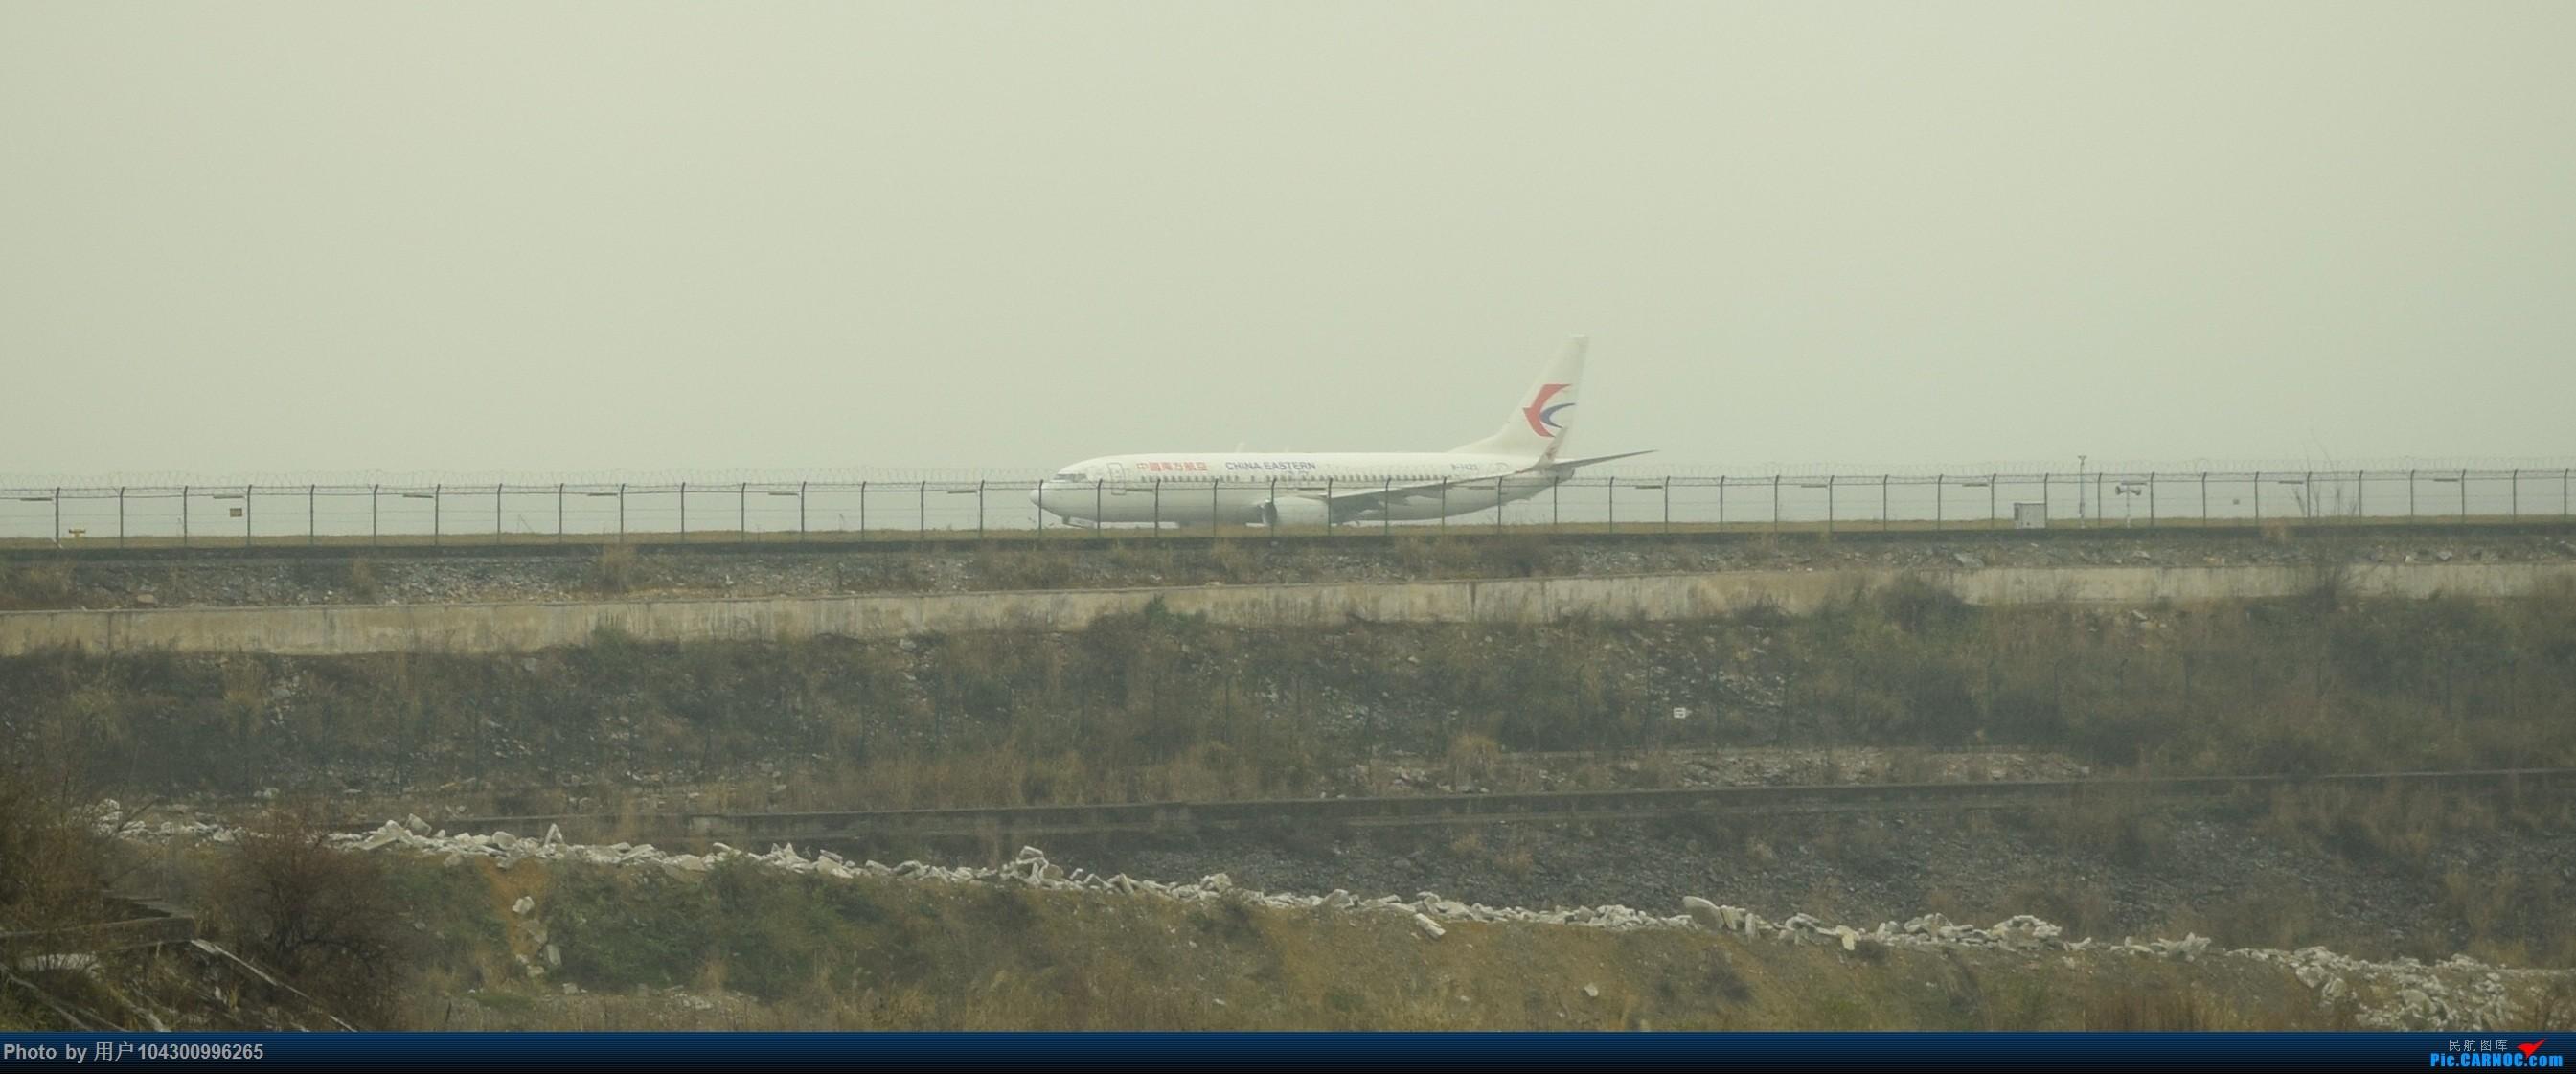 Re:[原创][KWE]贵阳龙洞堡拍机 BOEING 737-800 B-1422 中国贵阳龙洞堡国际机场